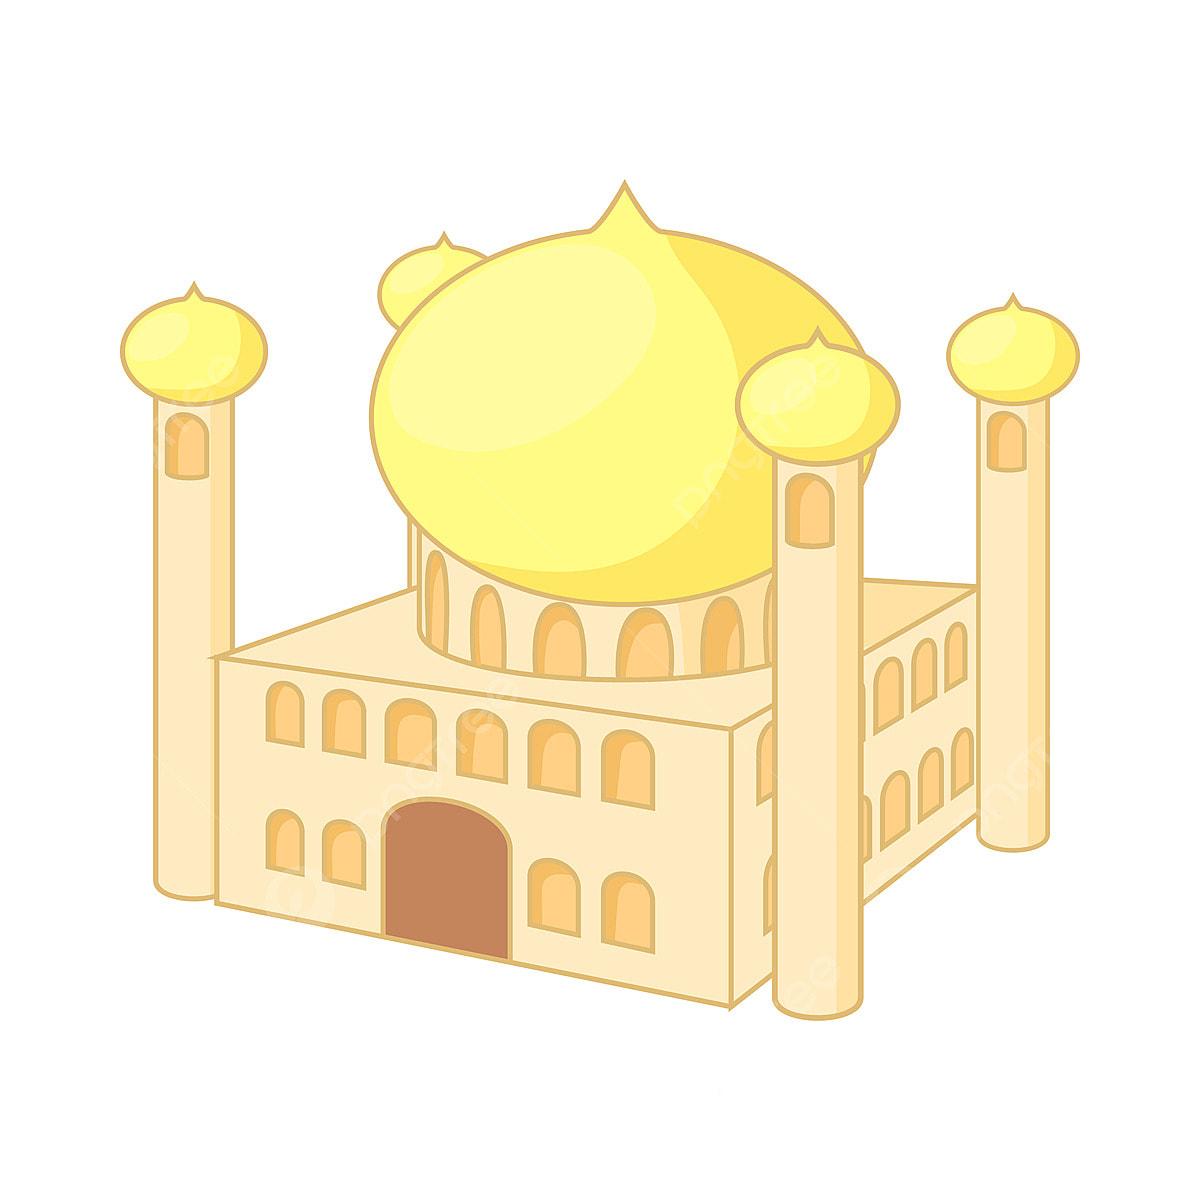 Jumeirah Masjid Dubai Ikon Gaya Kartun Menara Masjid Kartun Png